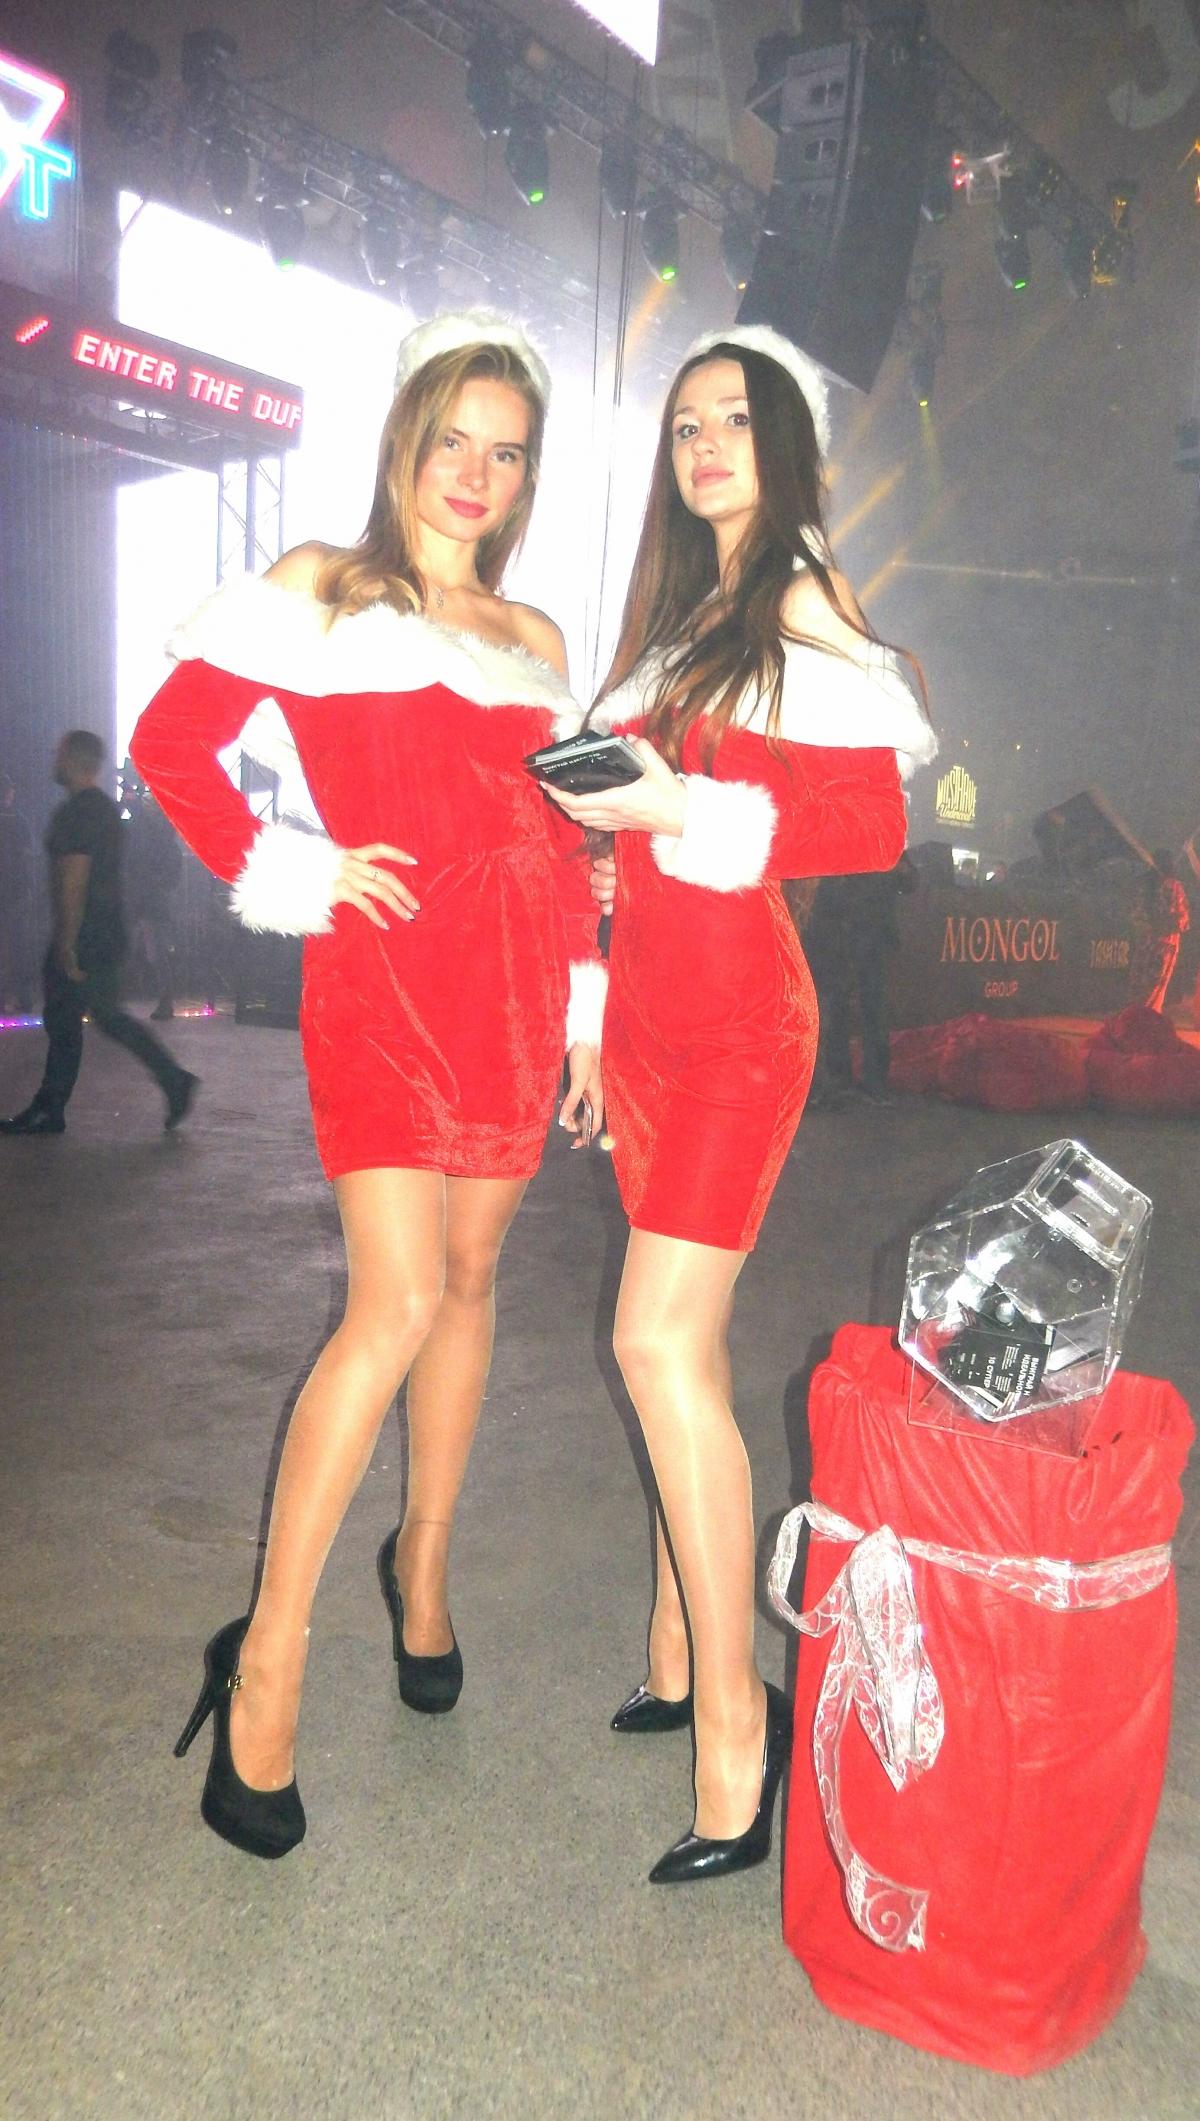 JohnCalliano Christmass 2019. Помощники Санты